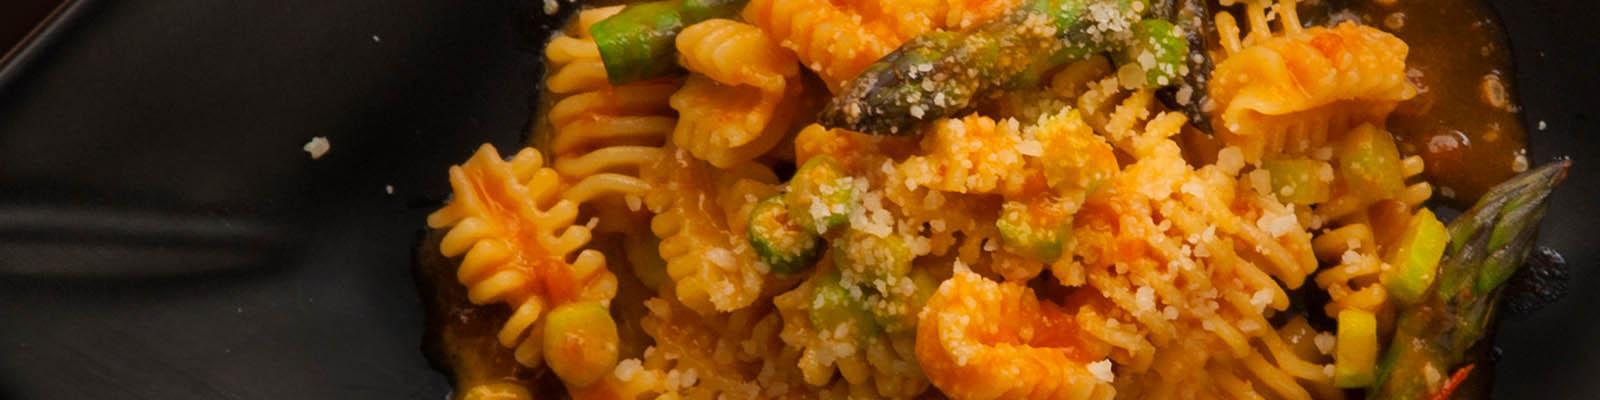 Pasta Garofalo - Radiatori met groene asperges